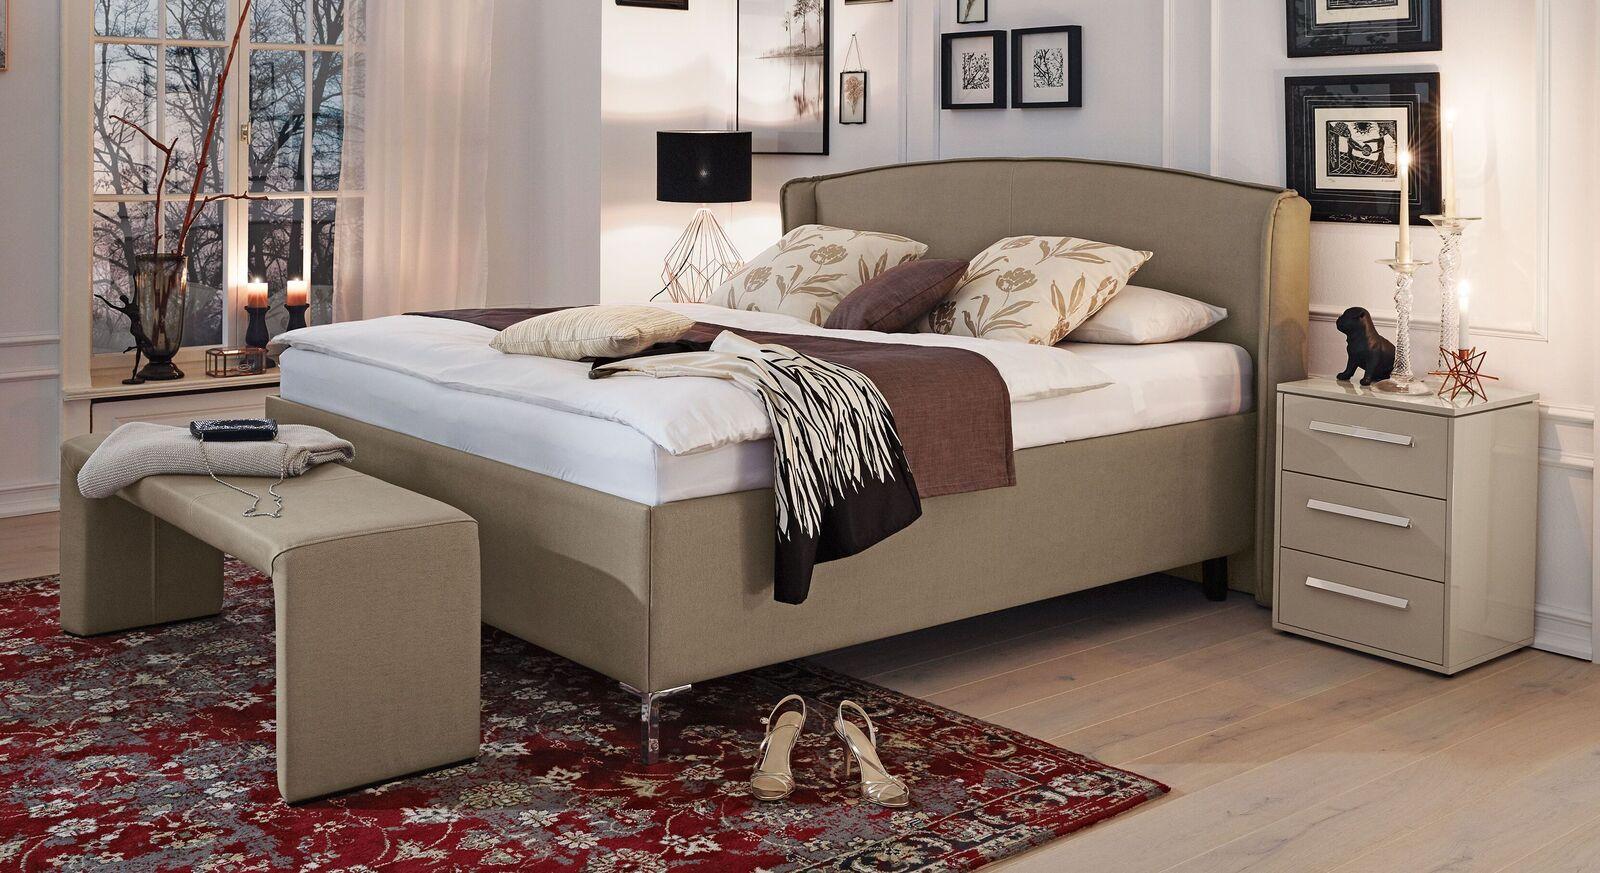 MUSTERRING Bett Epos mit Seitenwangen in Komforthöhe